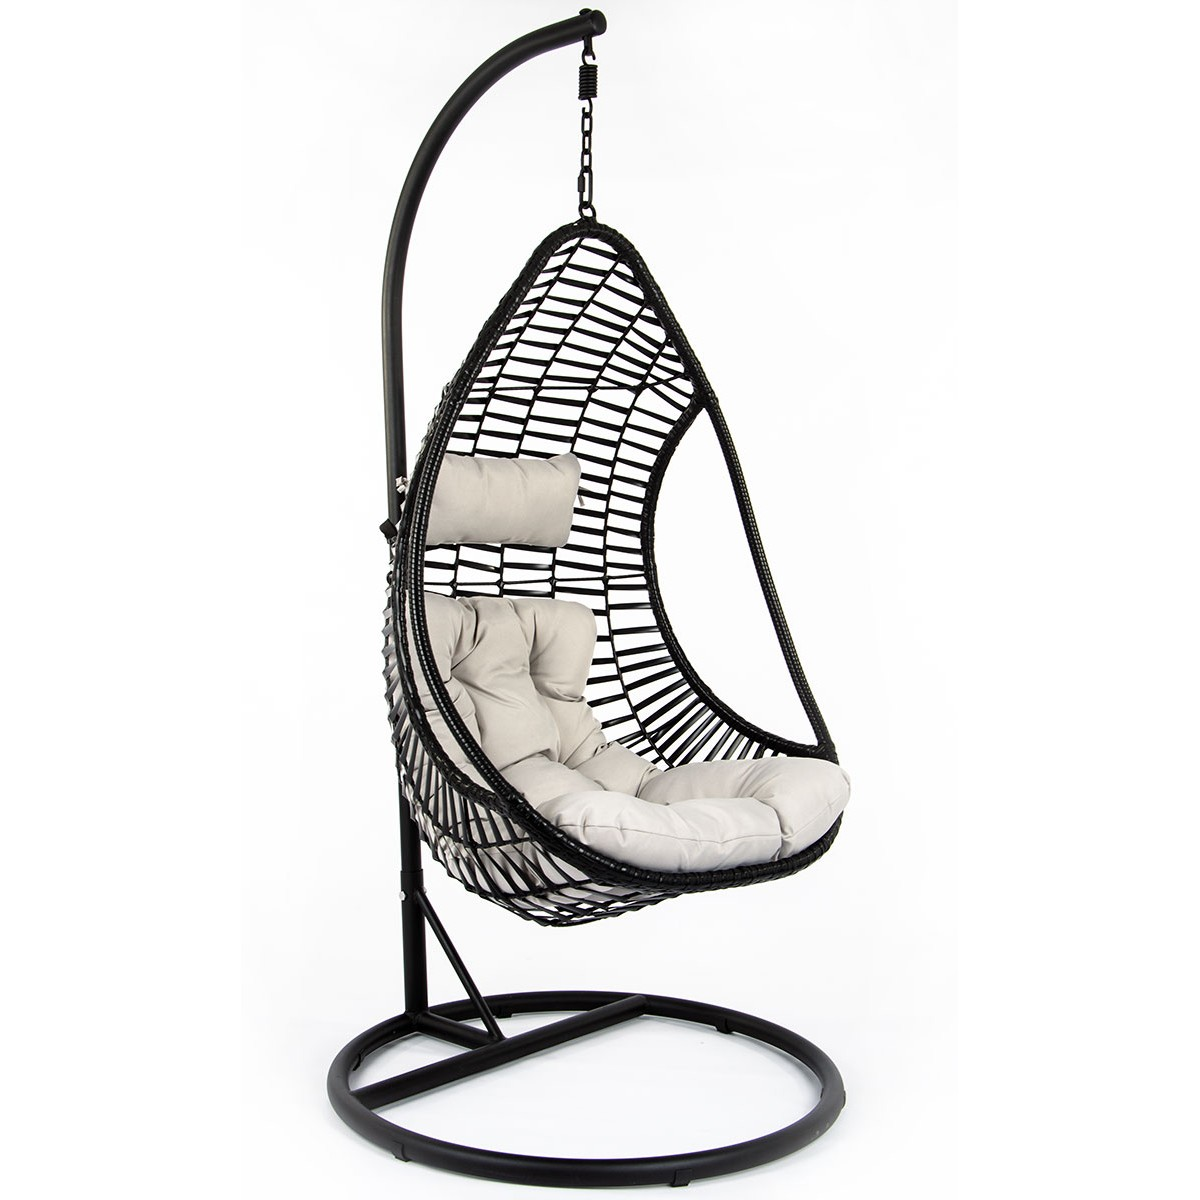 Huśtawka fotel wiszący kokon Crescent Delux czarny szary